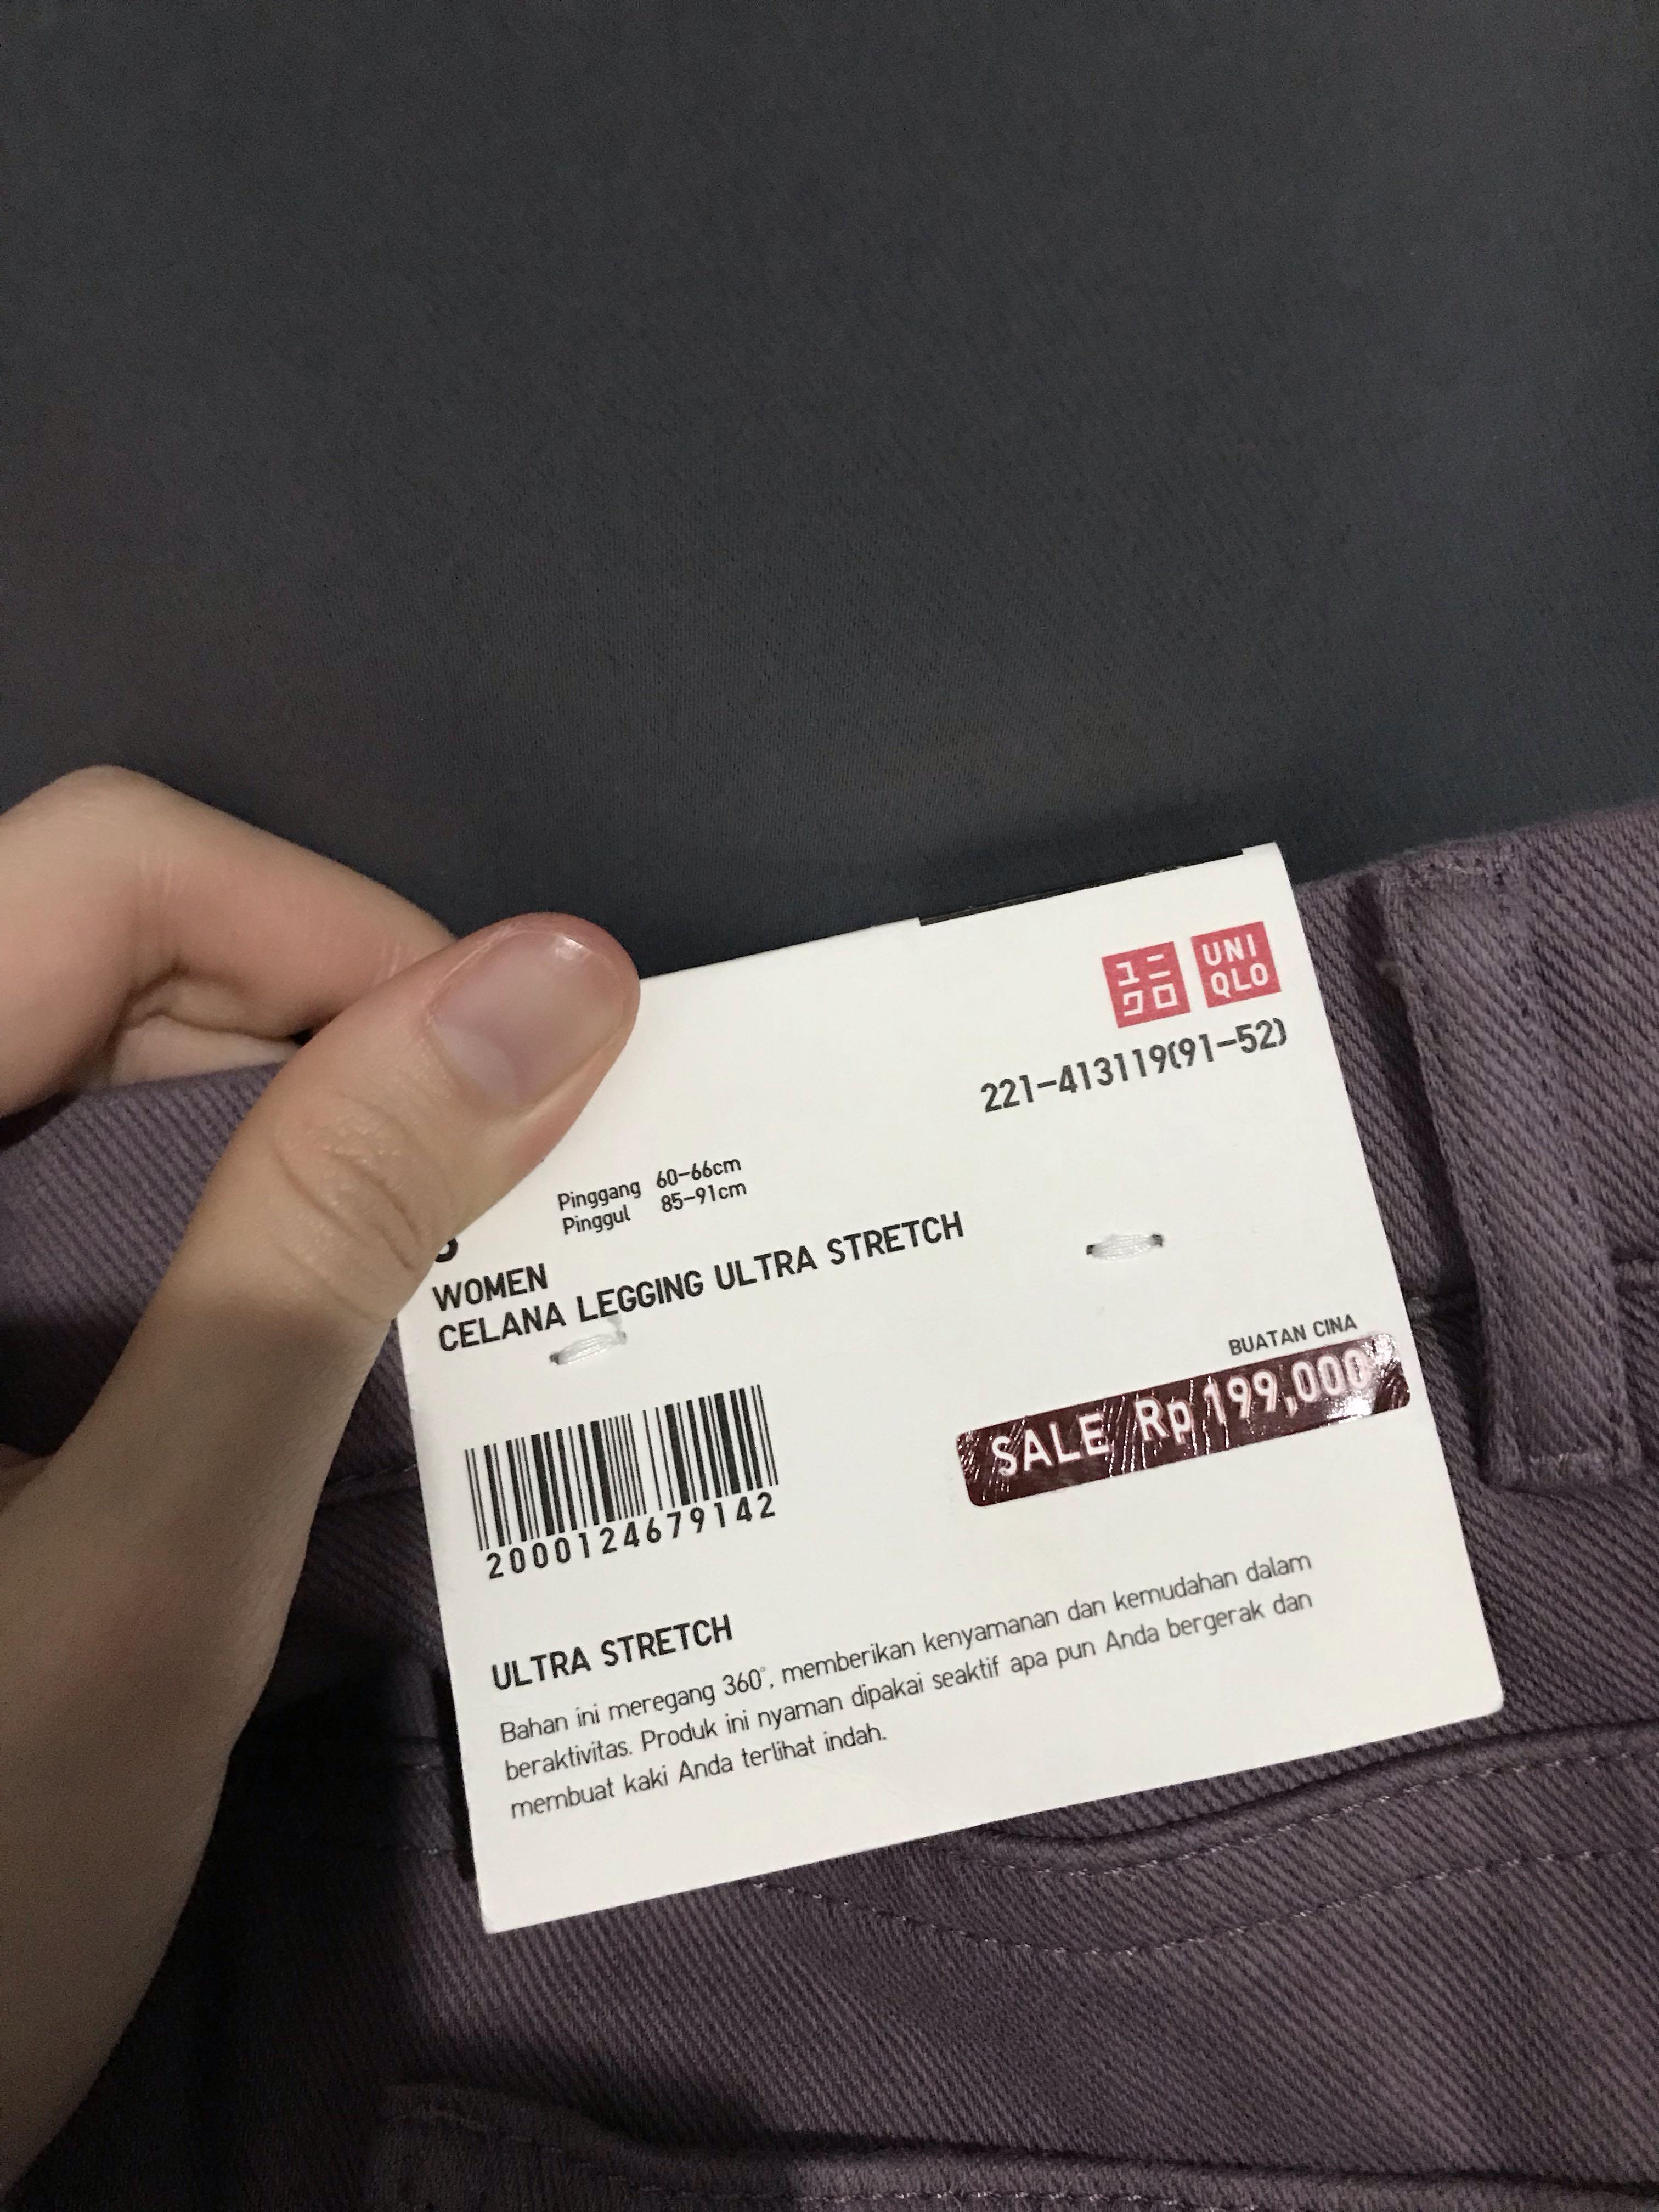 Uniqlo Leggings Ultra Stretch Semi Jeans Ungu Purple Burgundy Celana Uniqlo Fesyen Wanita Pakaian Wanita Bawahan Di Carousell